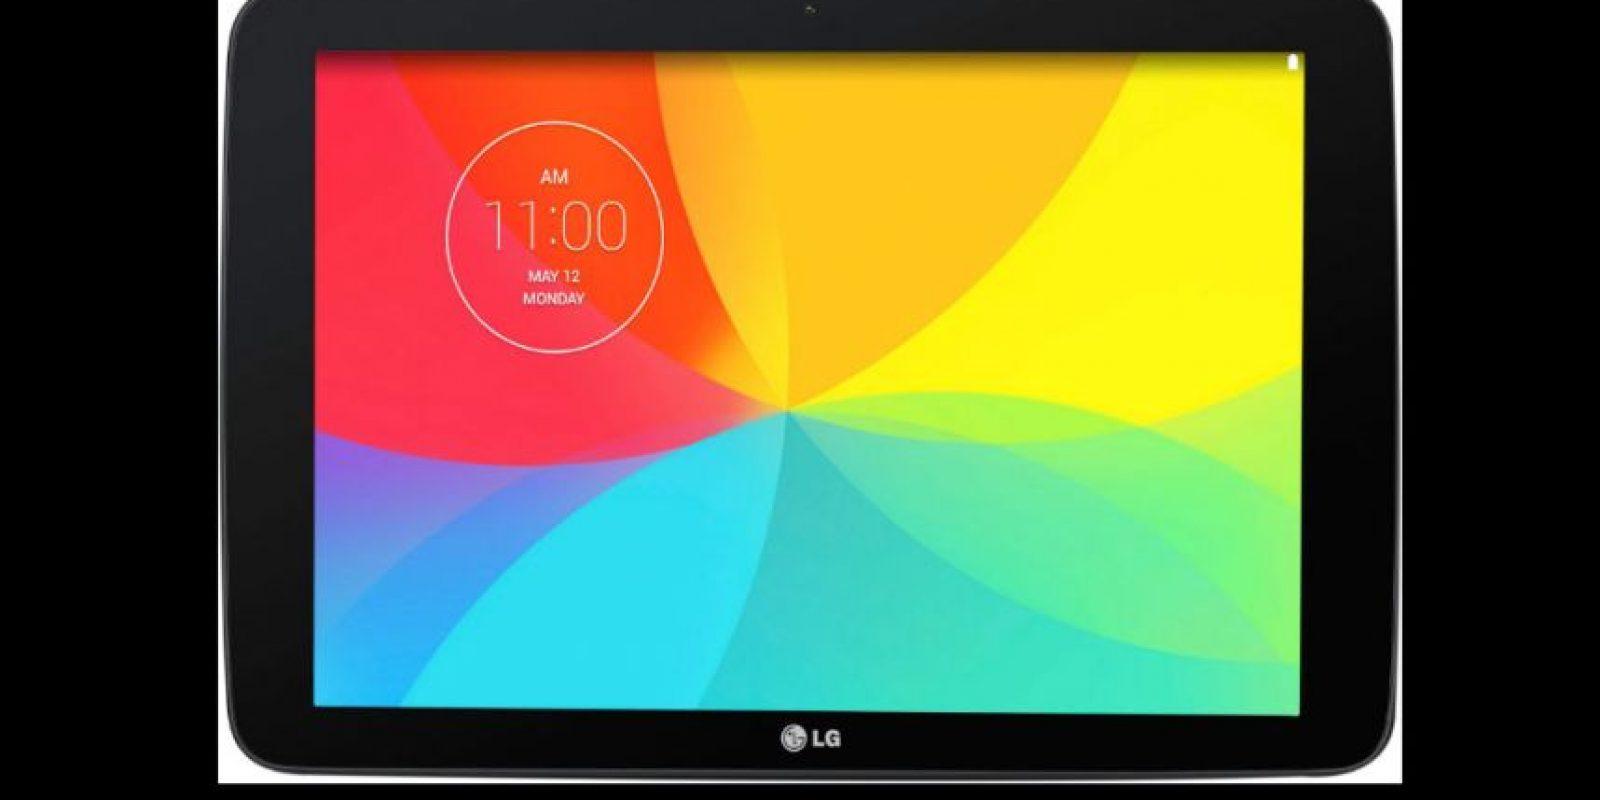 Y cámara trasera de 5 megapíxeles y frontal de 2 megapíxeles Foto:LG